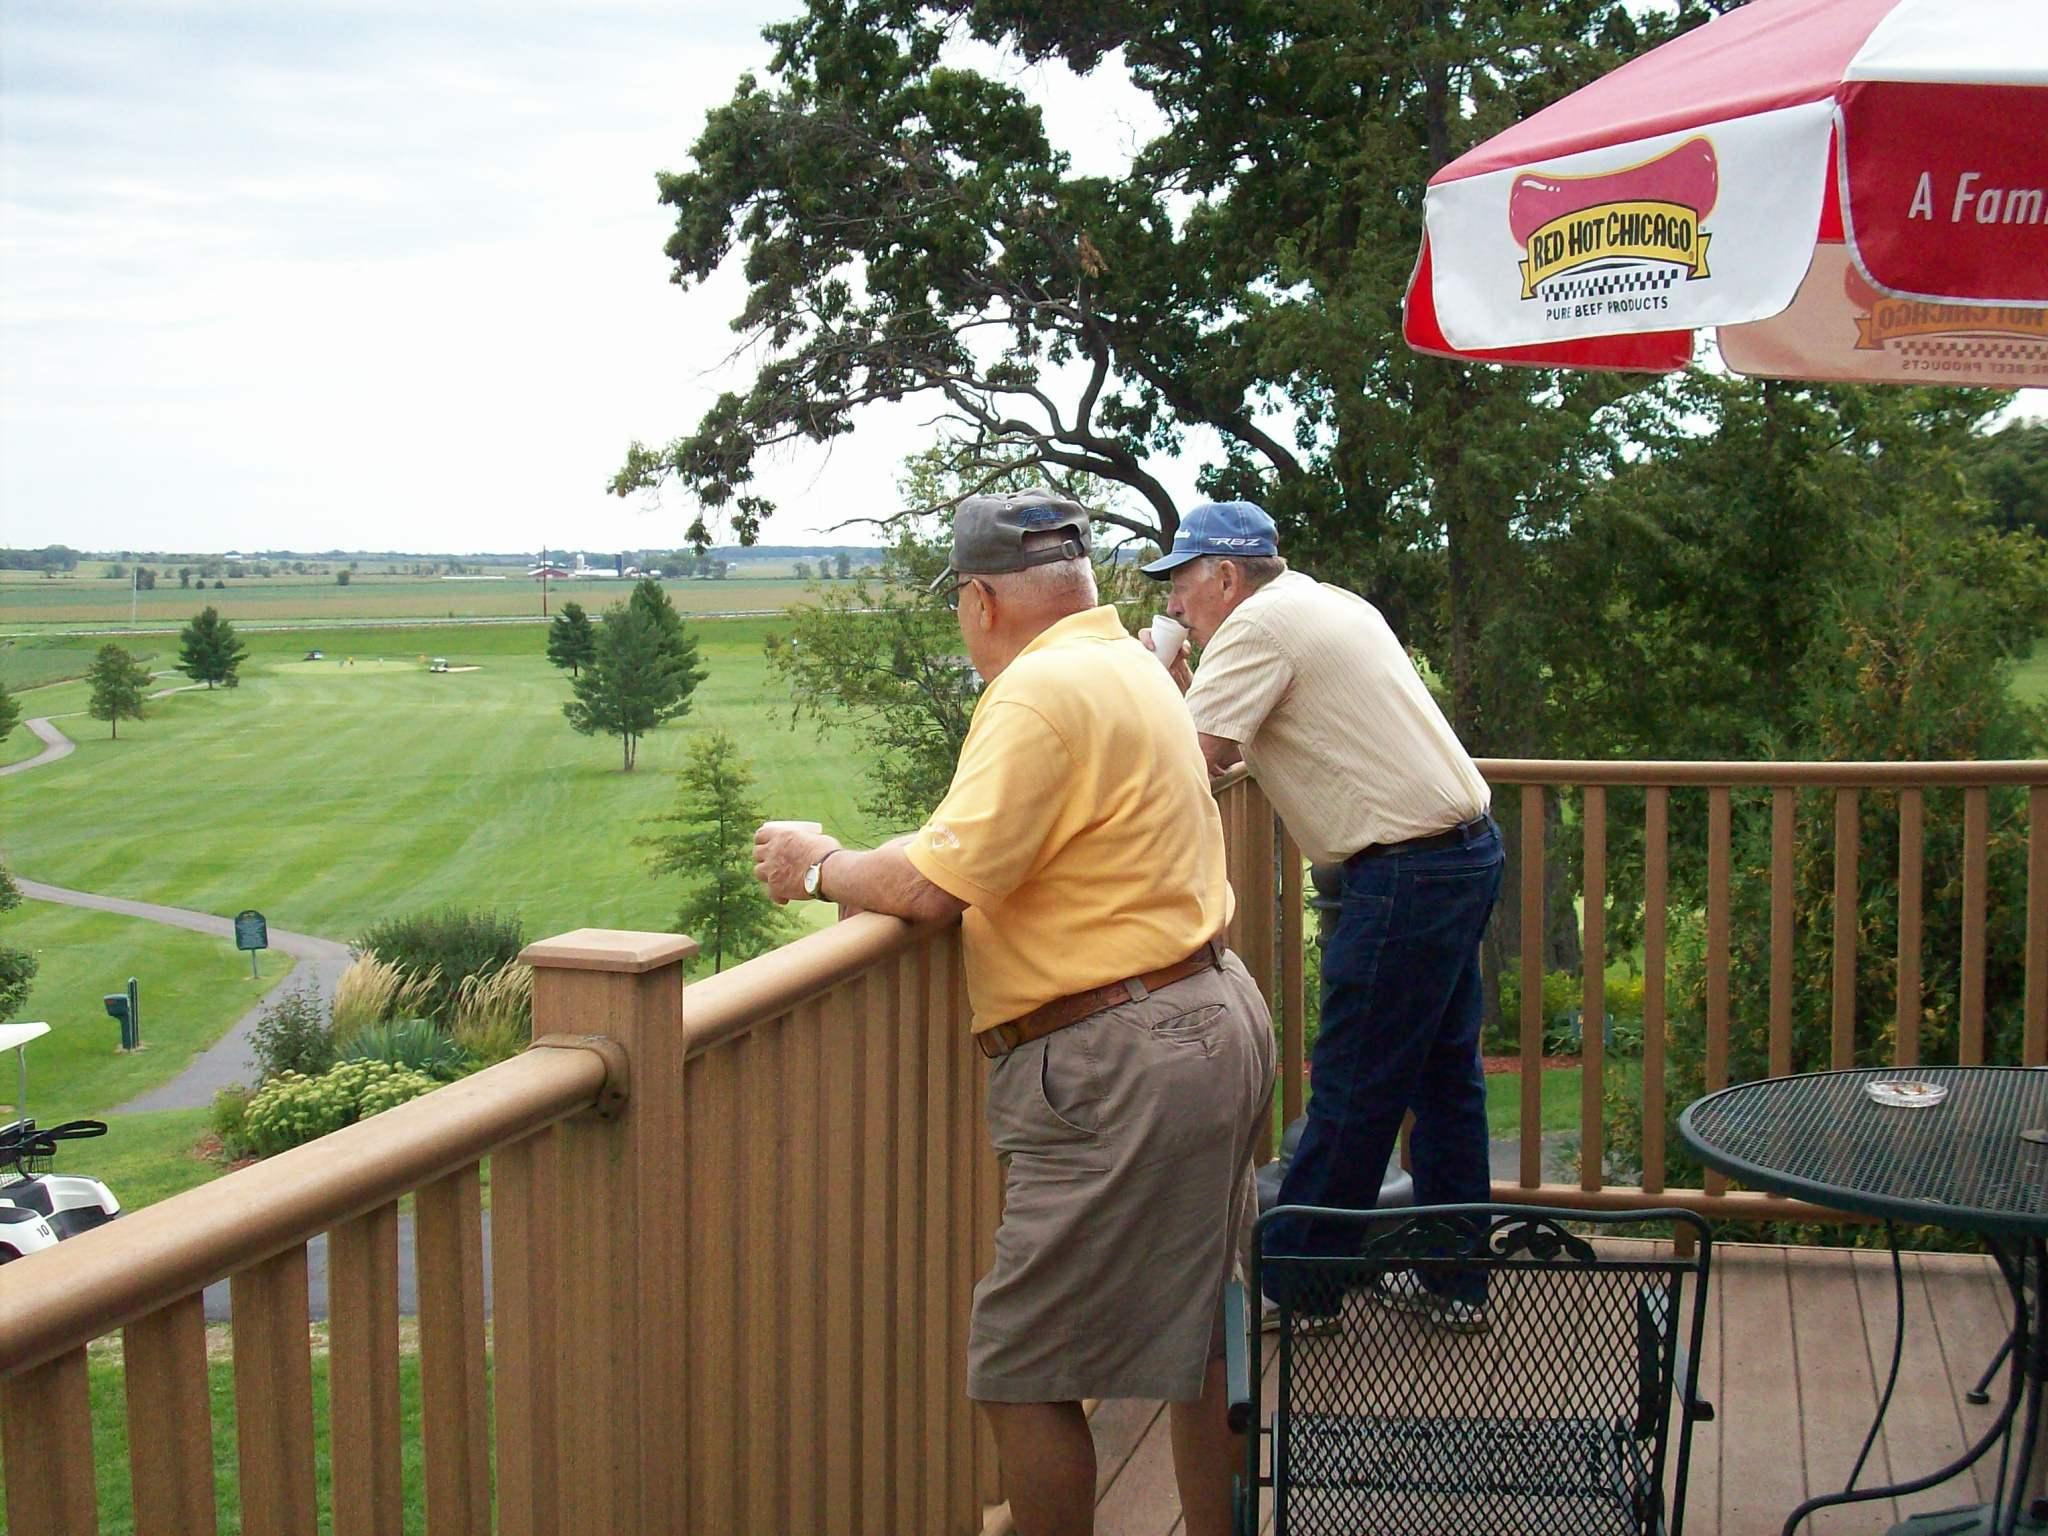 Bass Creek Golf Club image 11